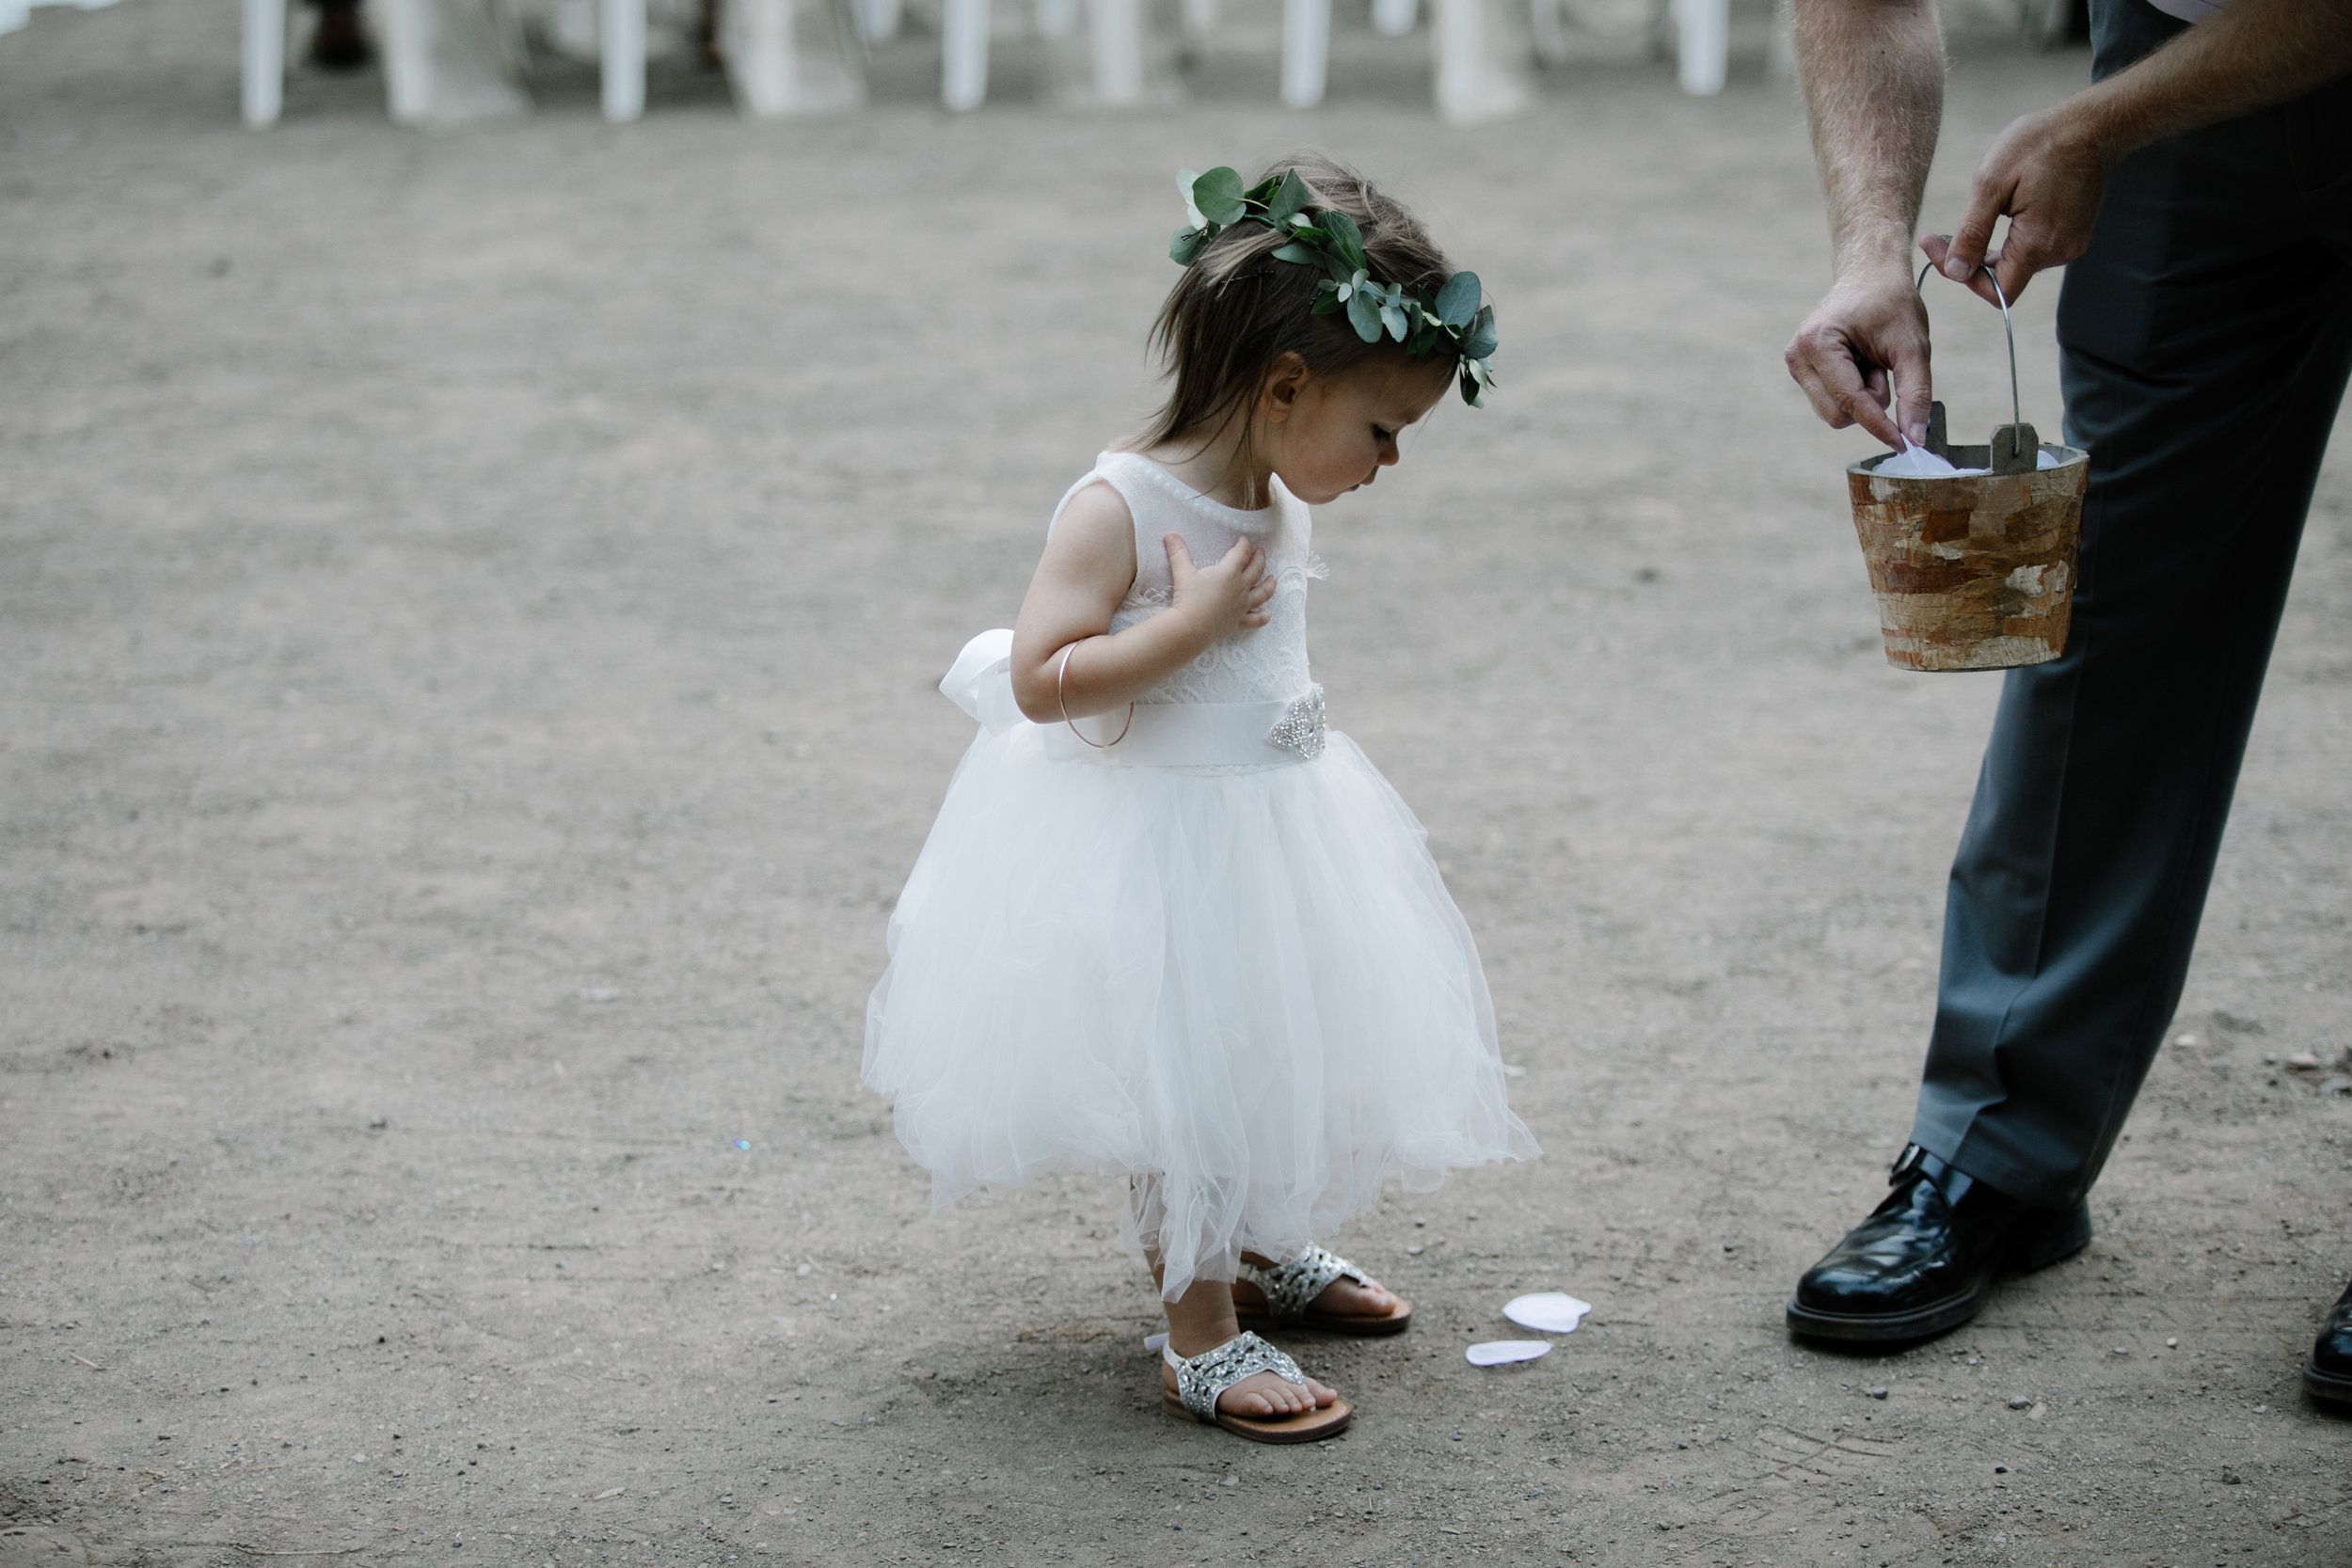 Sevlynn-Photography-Teresa-Chandler-Wedding-44.jpg